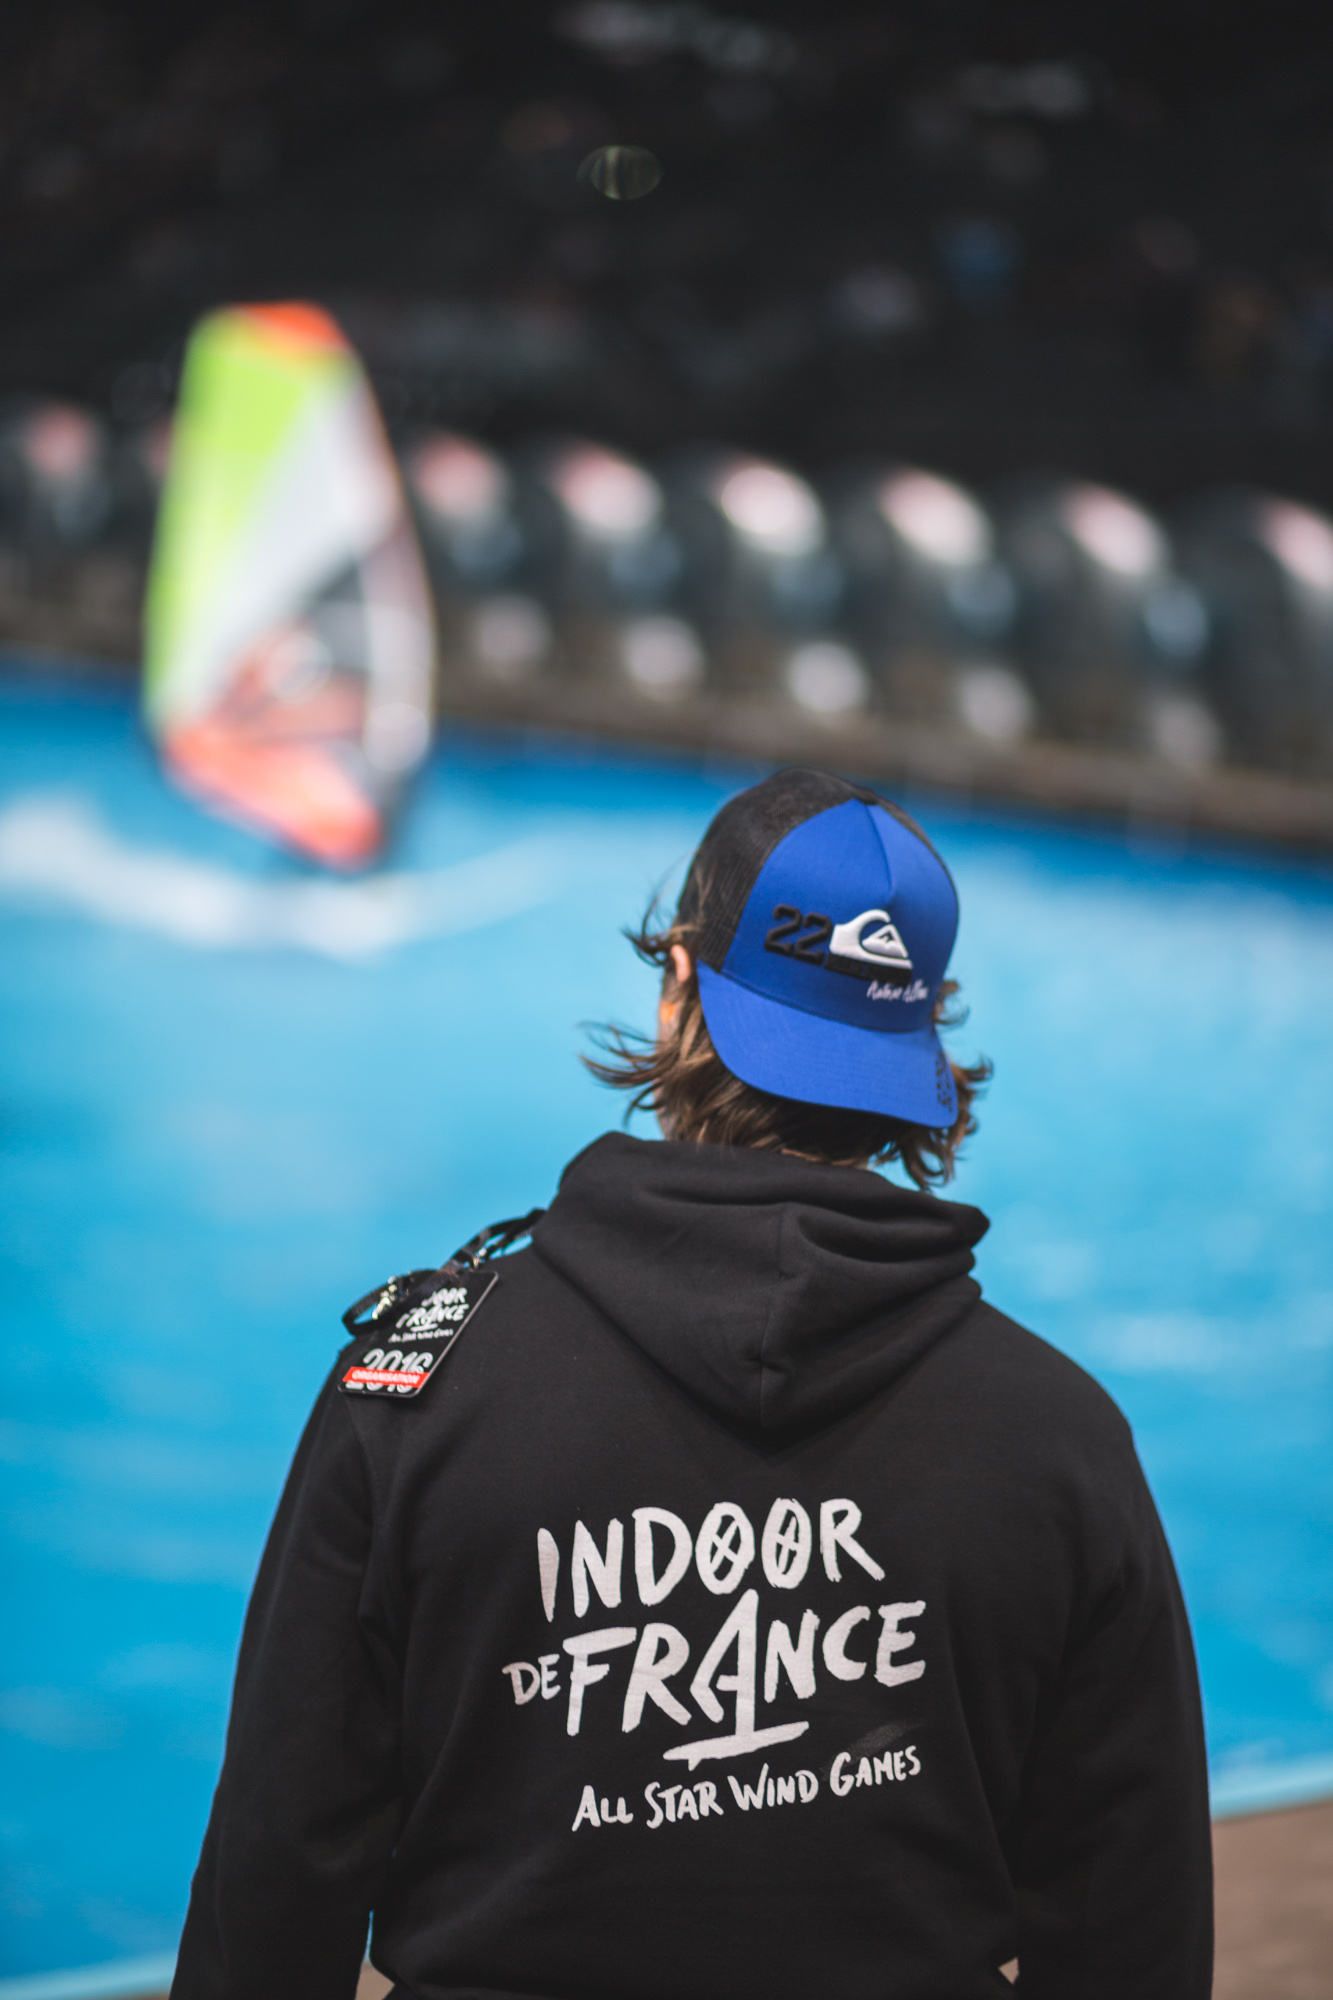 Indoor-windsurf-6